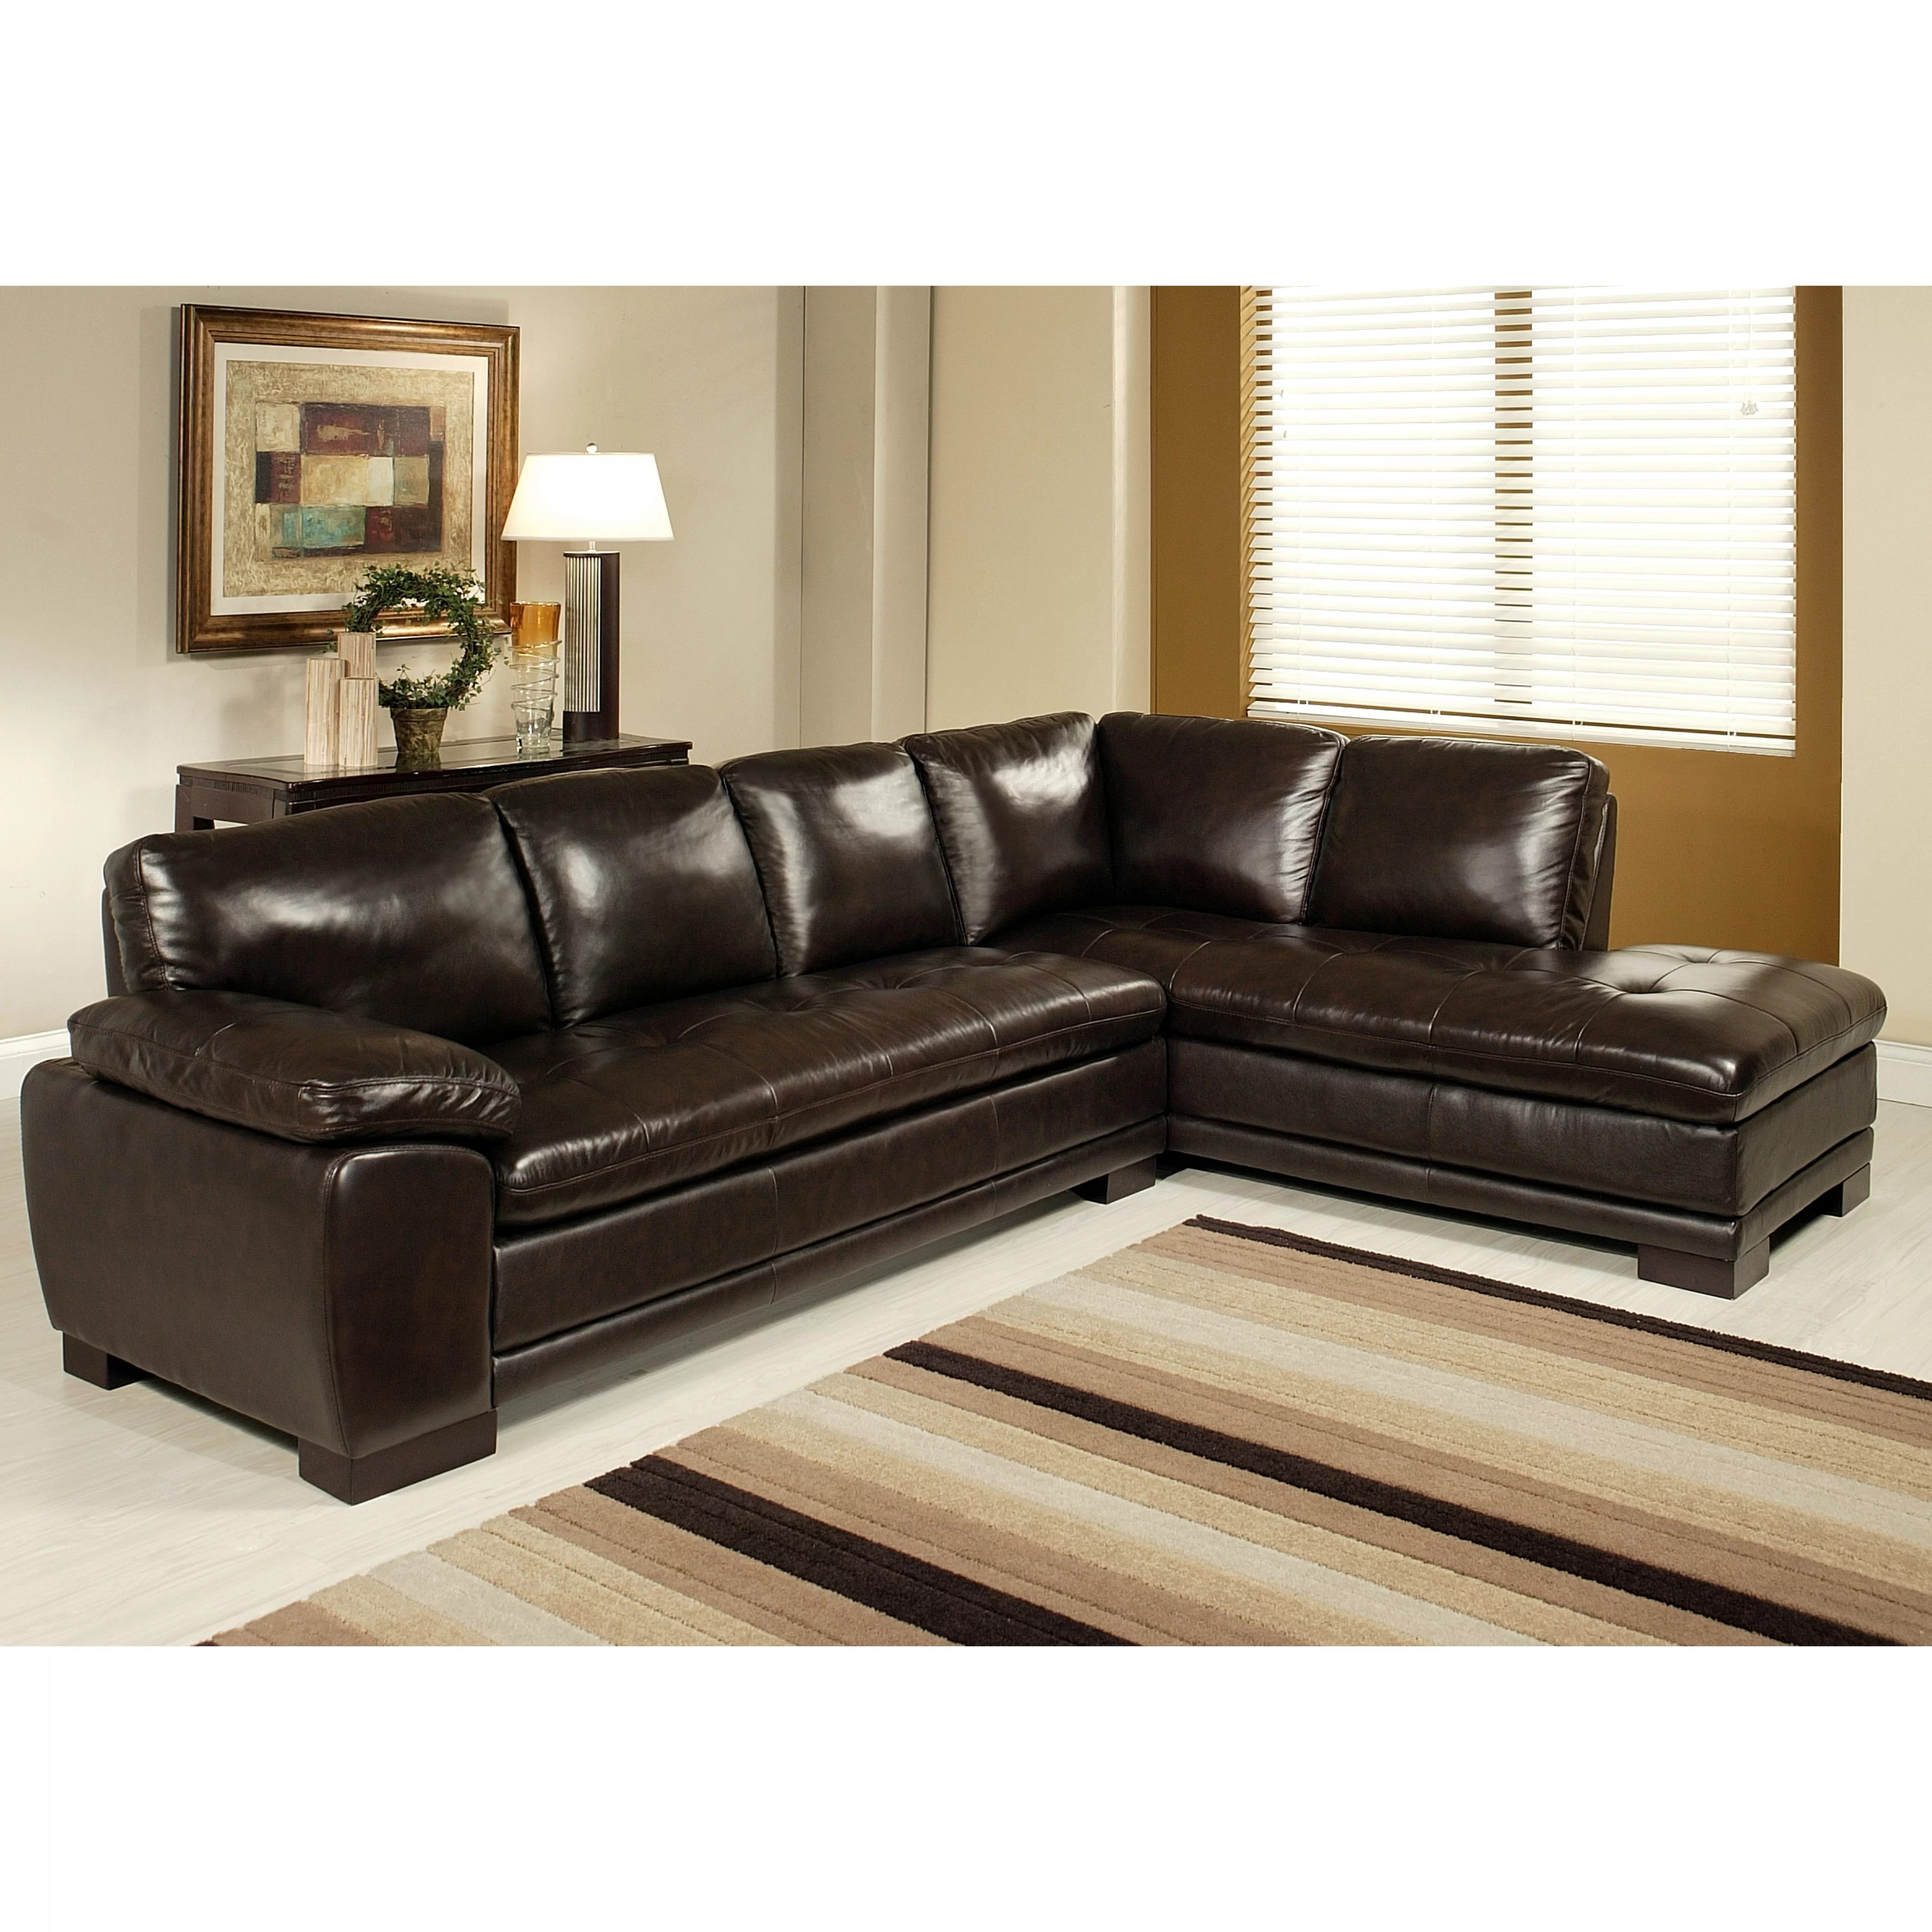 abbyson leather sofa rattan rounded corner living tivoli sectional and reviews wayfair